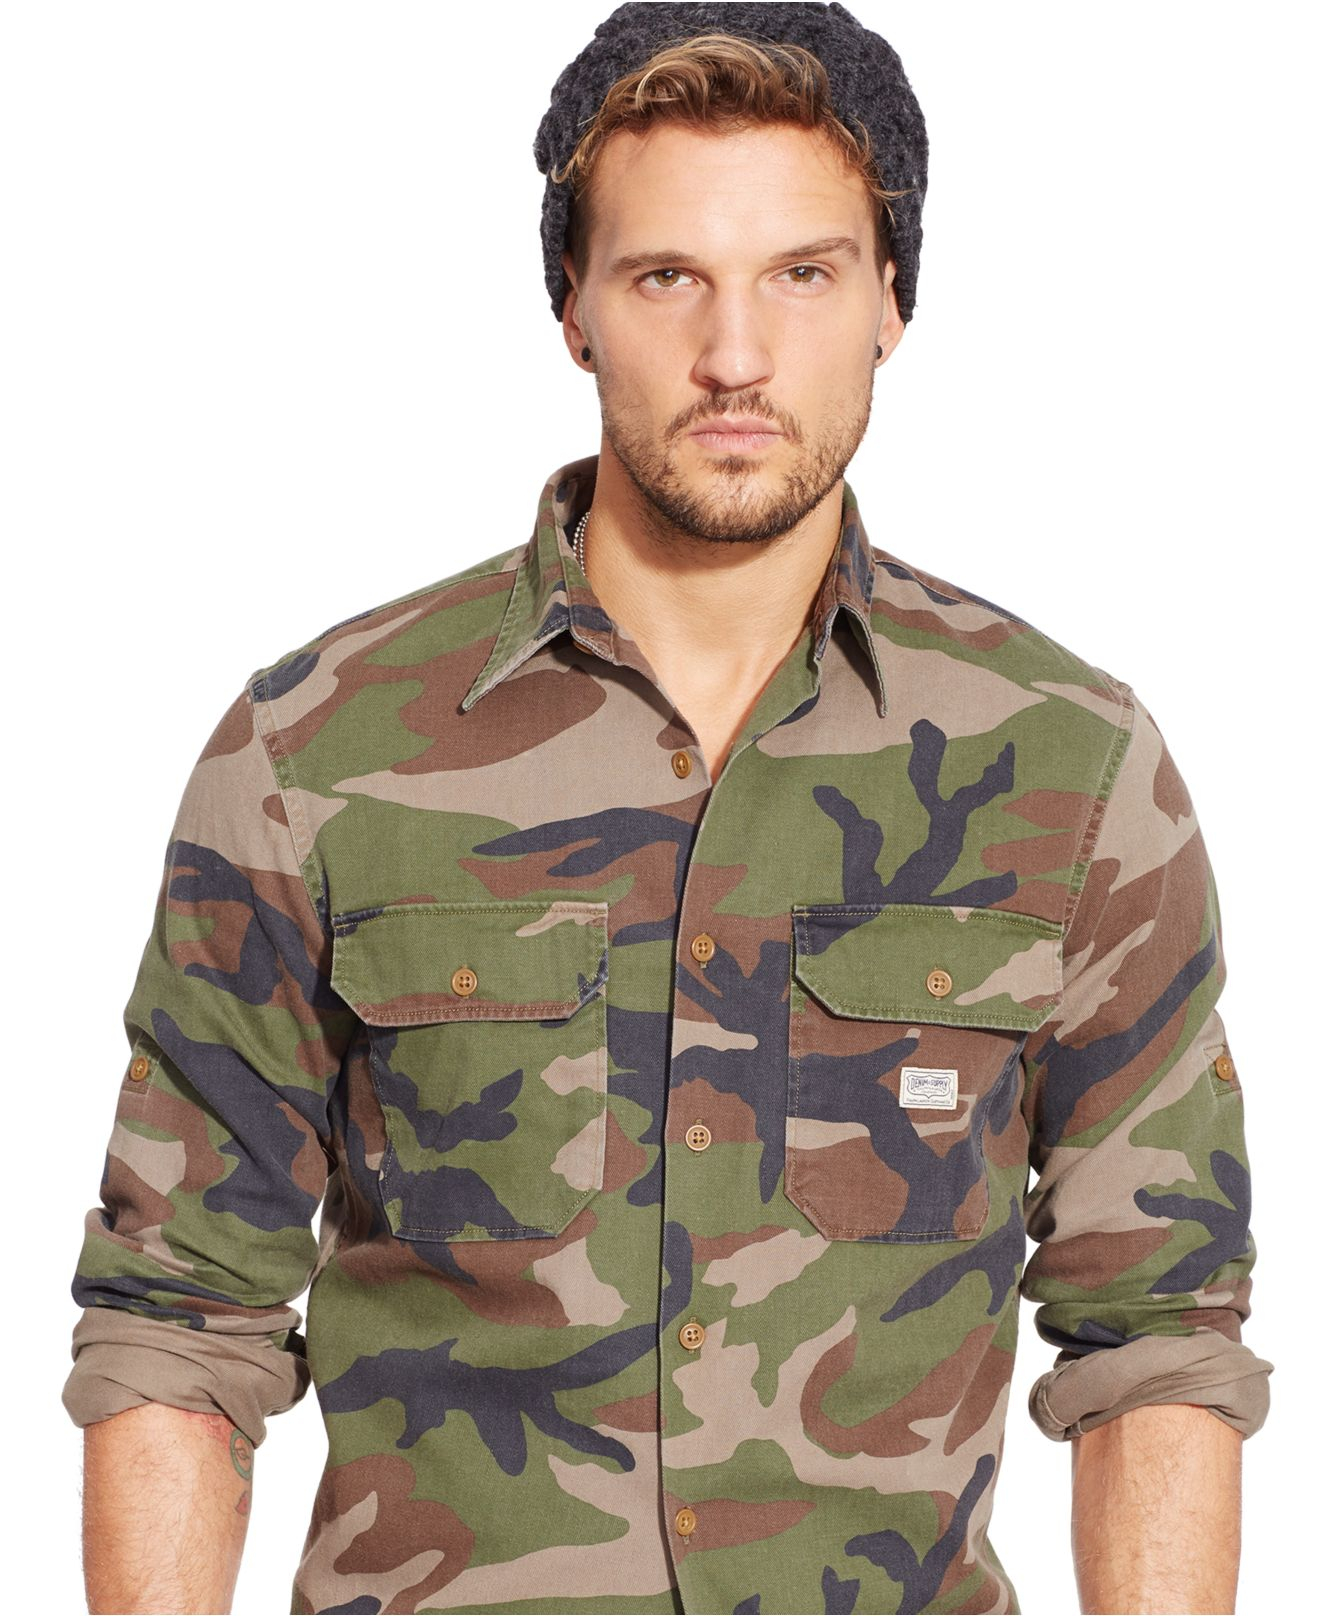 6bb3059ad19ed Denim & Supply Ralph Lauren Camo Military Shirt in Green for Men - Lyst